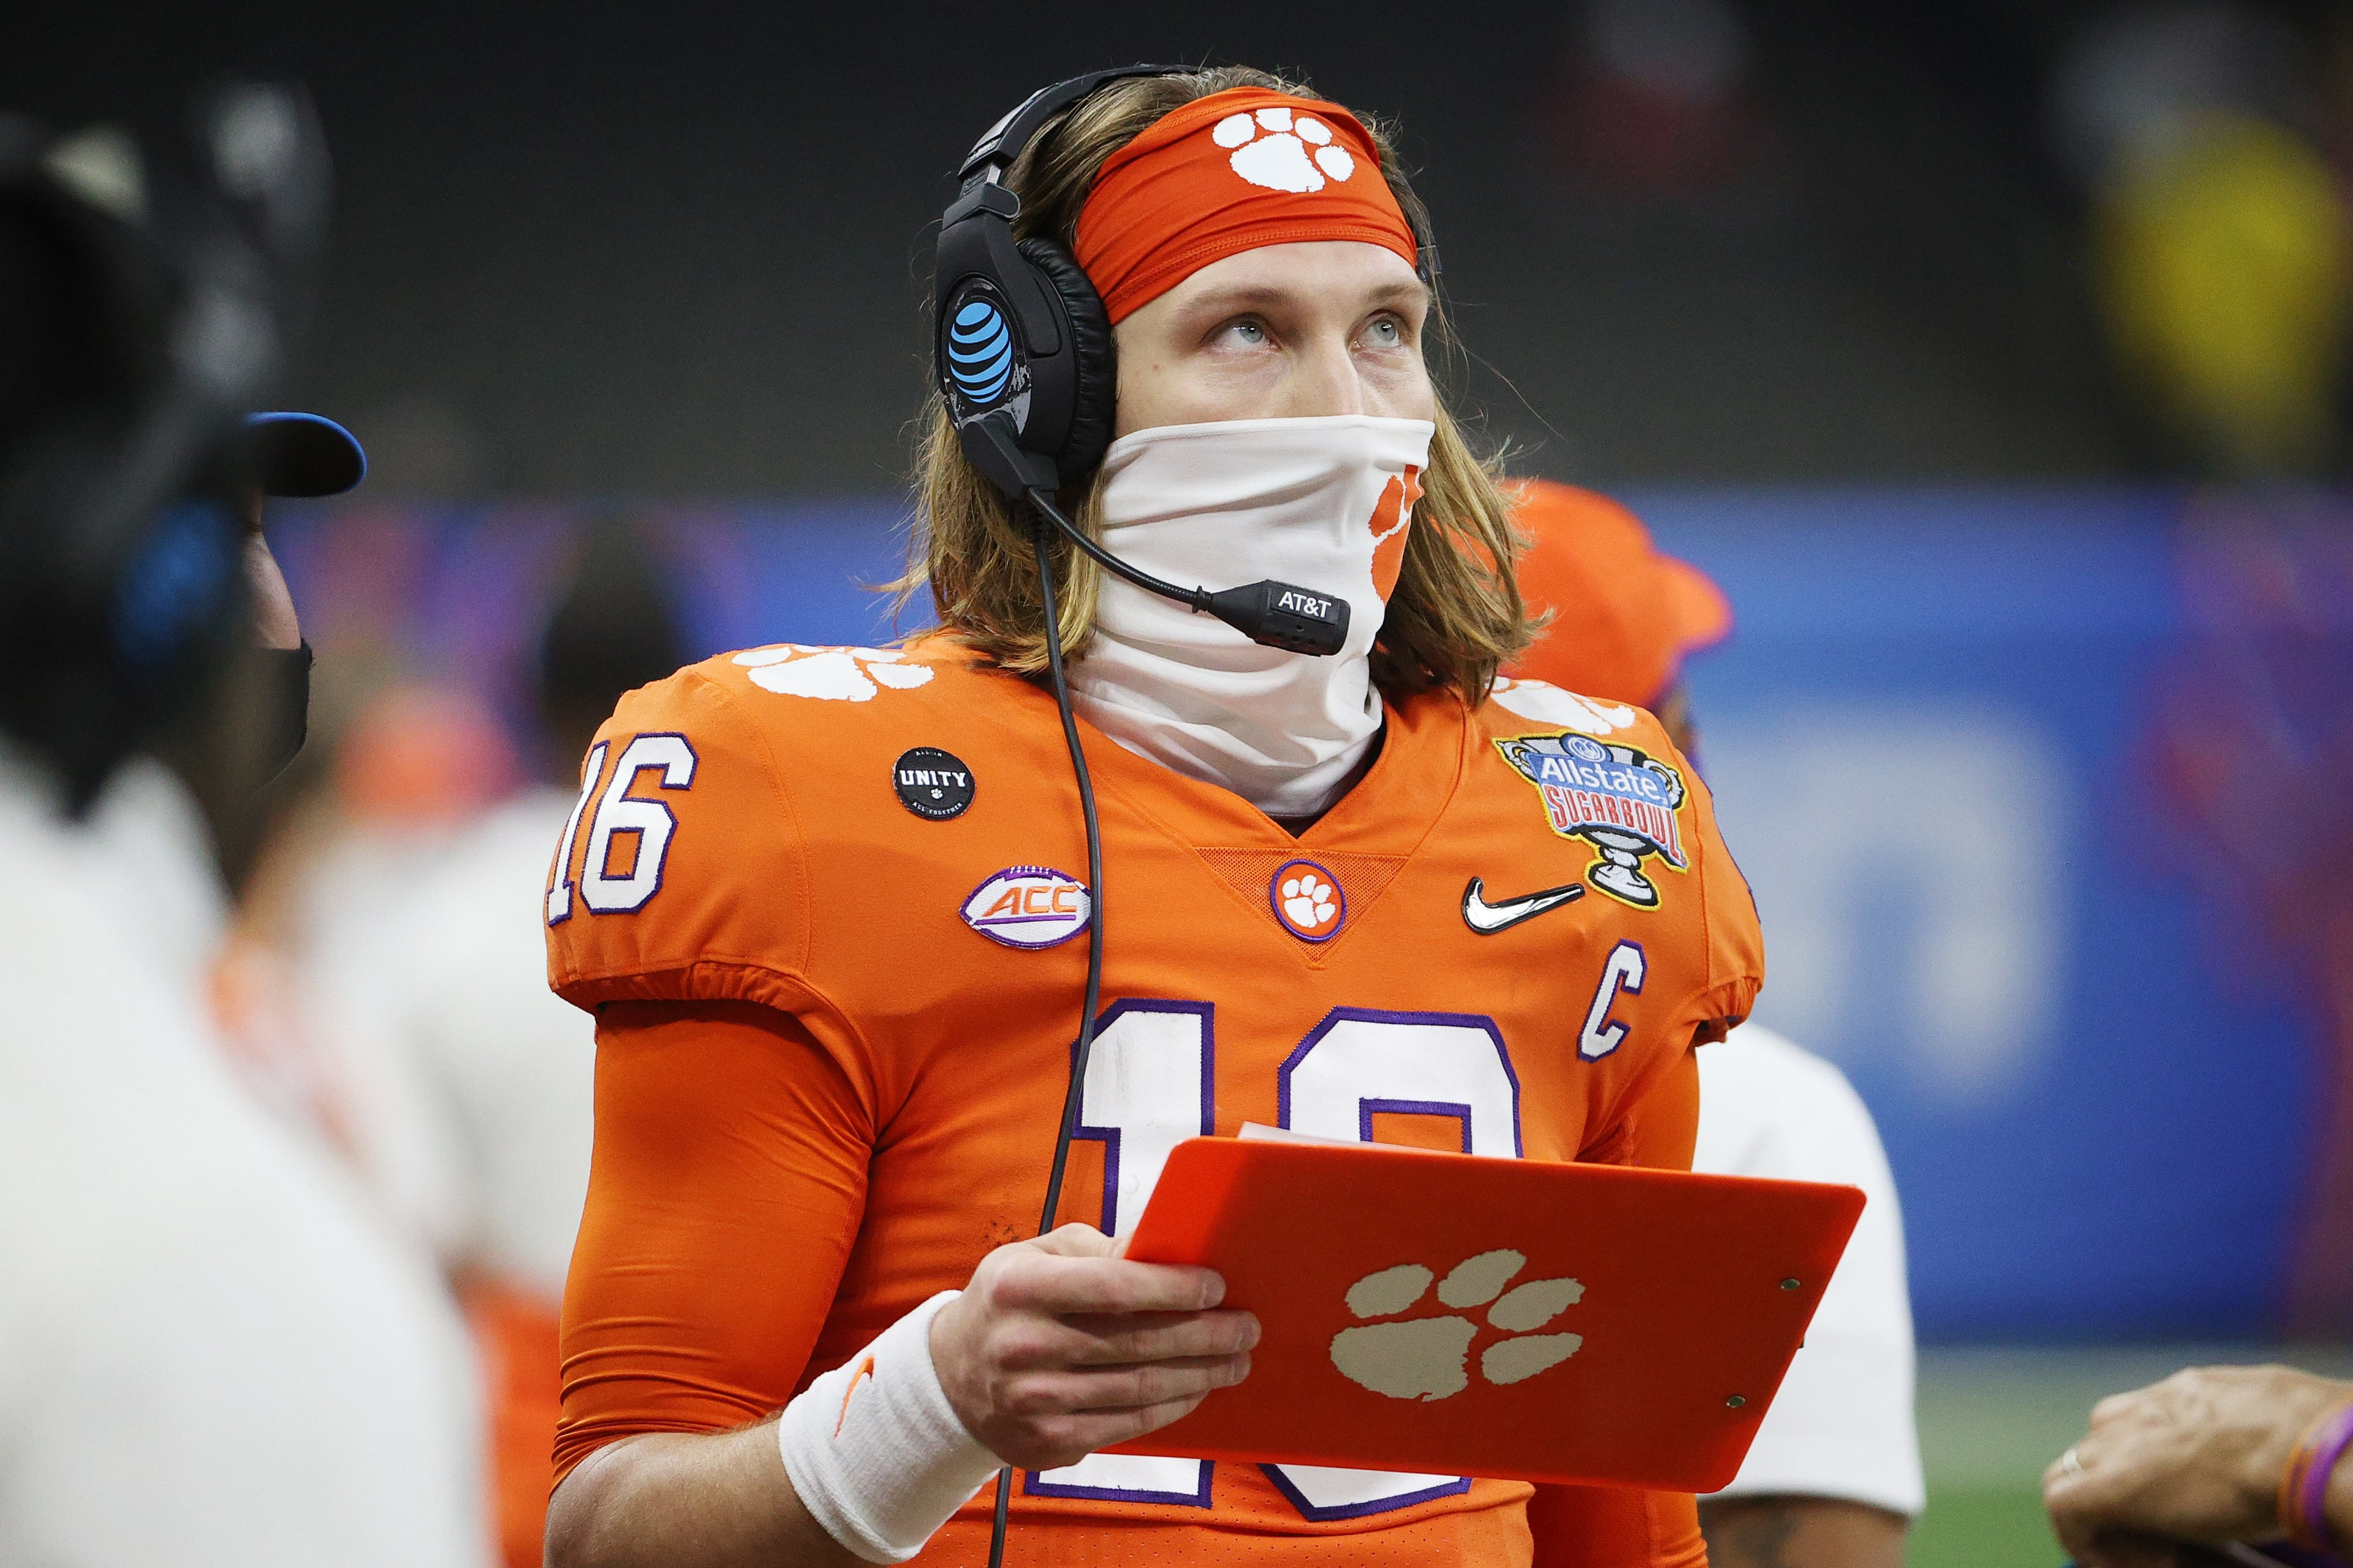 2021 NFL Draft: Post-Wildcard round first-round NFL mock draft